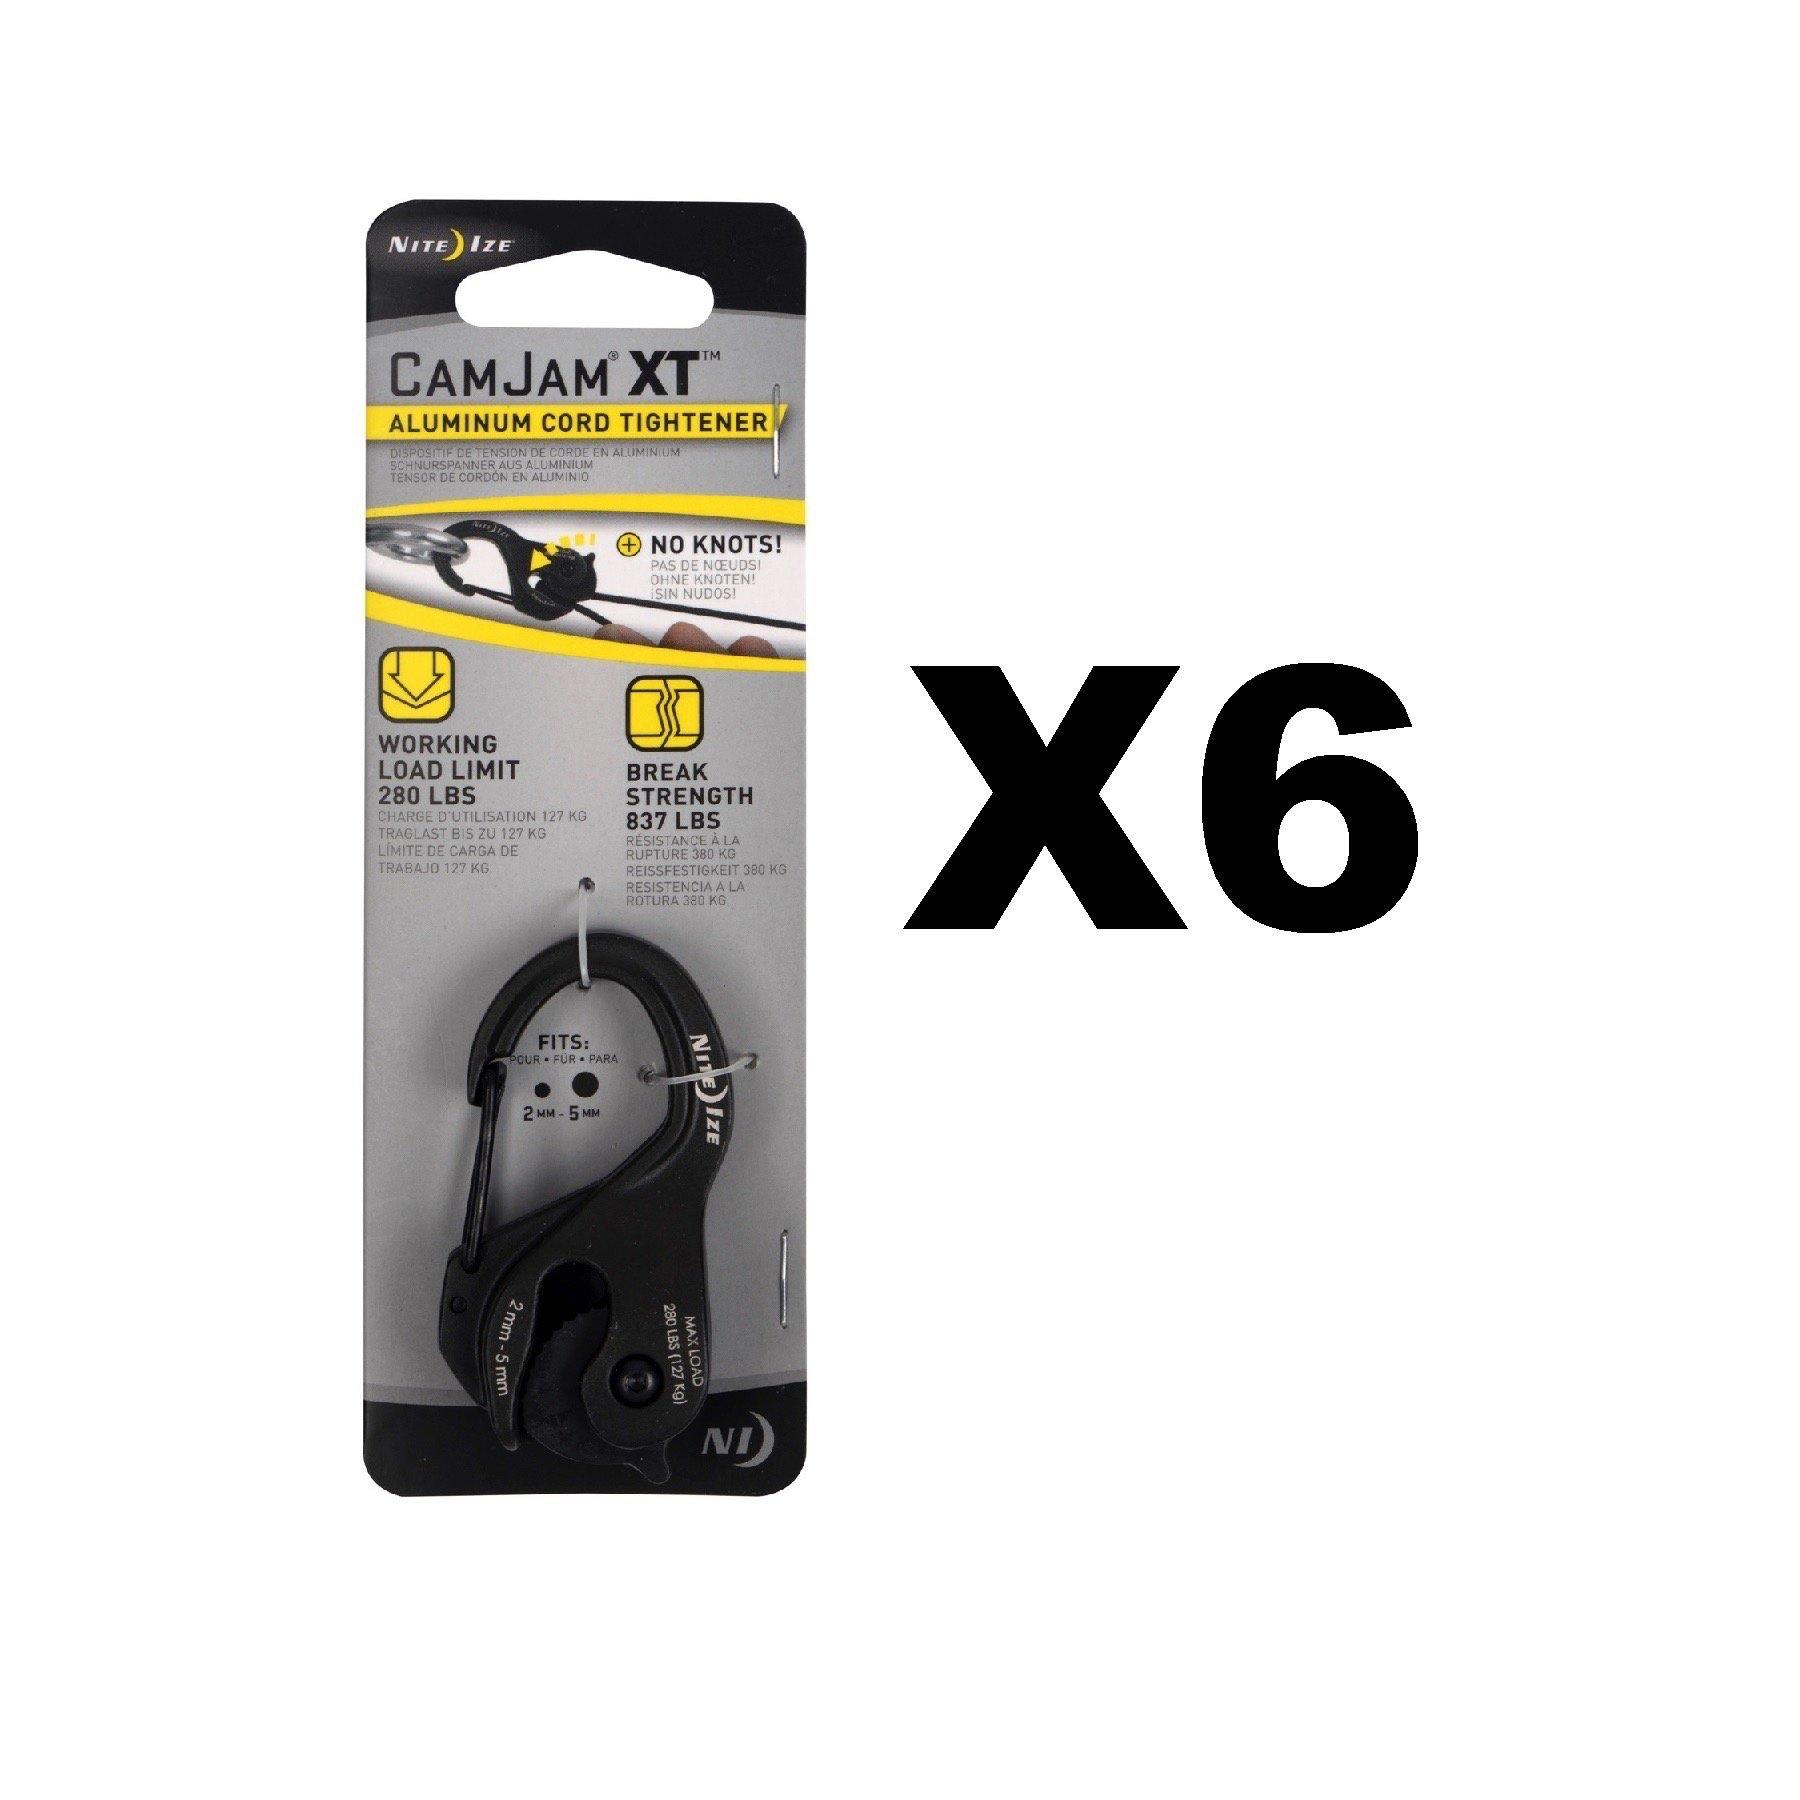 Nite Ize CamJam XT Black Aluminum Rope & Cord Tightener Tie Down Tool (6-Pack) by Nite Ize